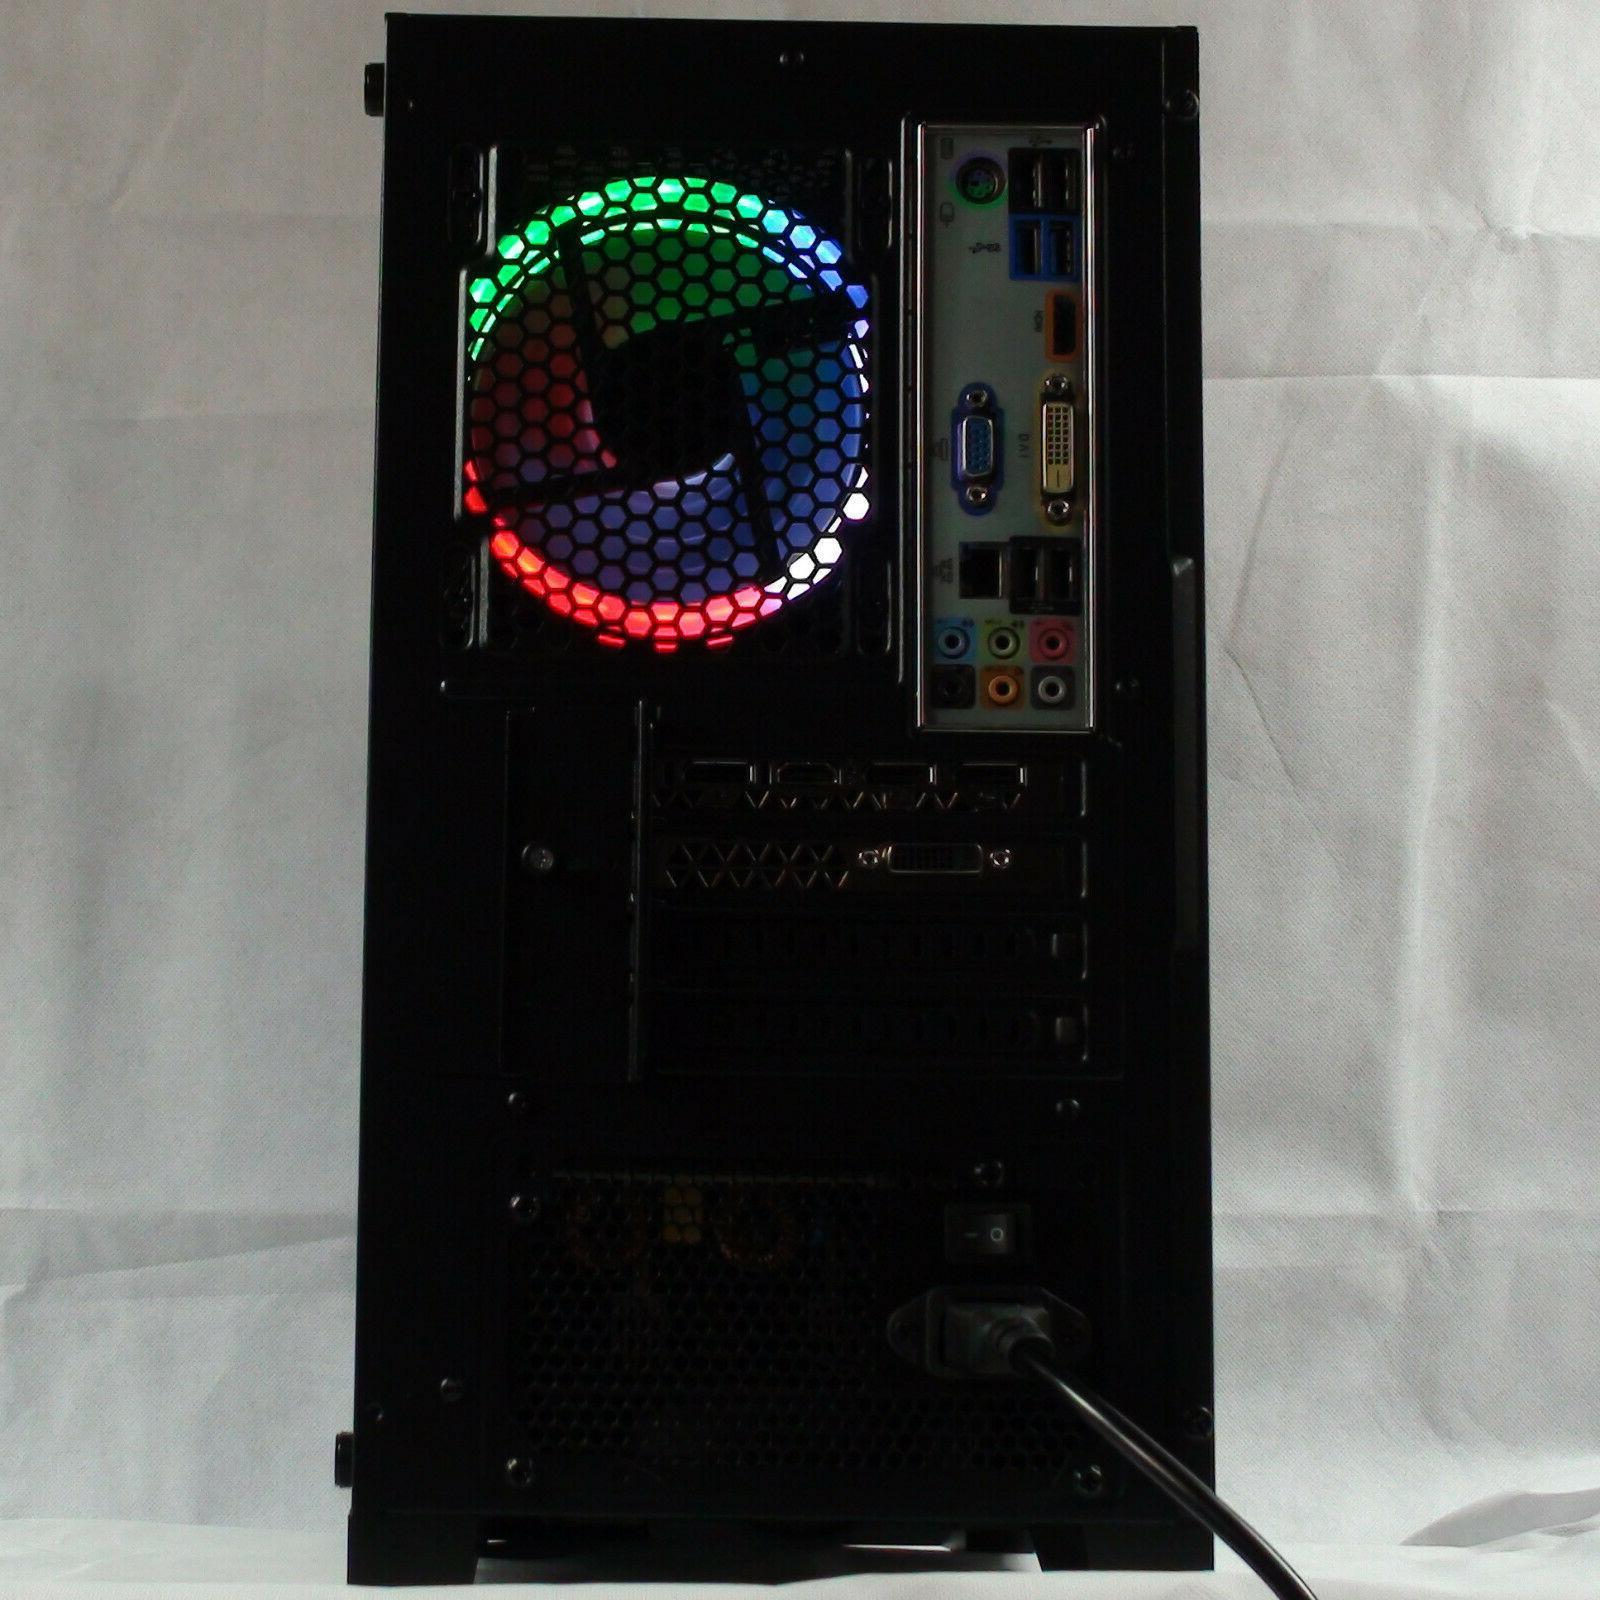 Intel 5.0G Gaming PC Computer 2TB 16GB GeForce GTX 1080